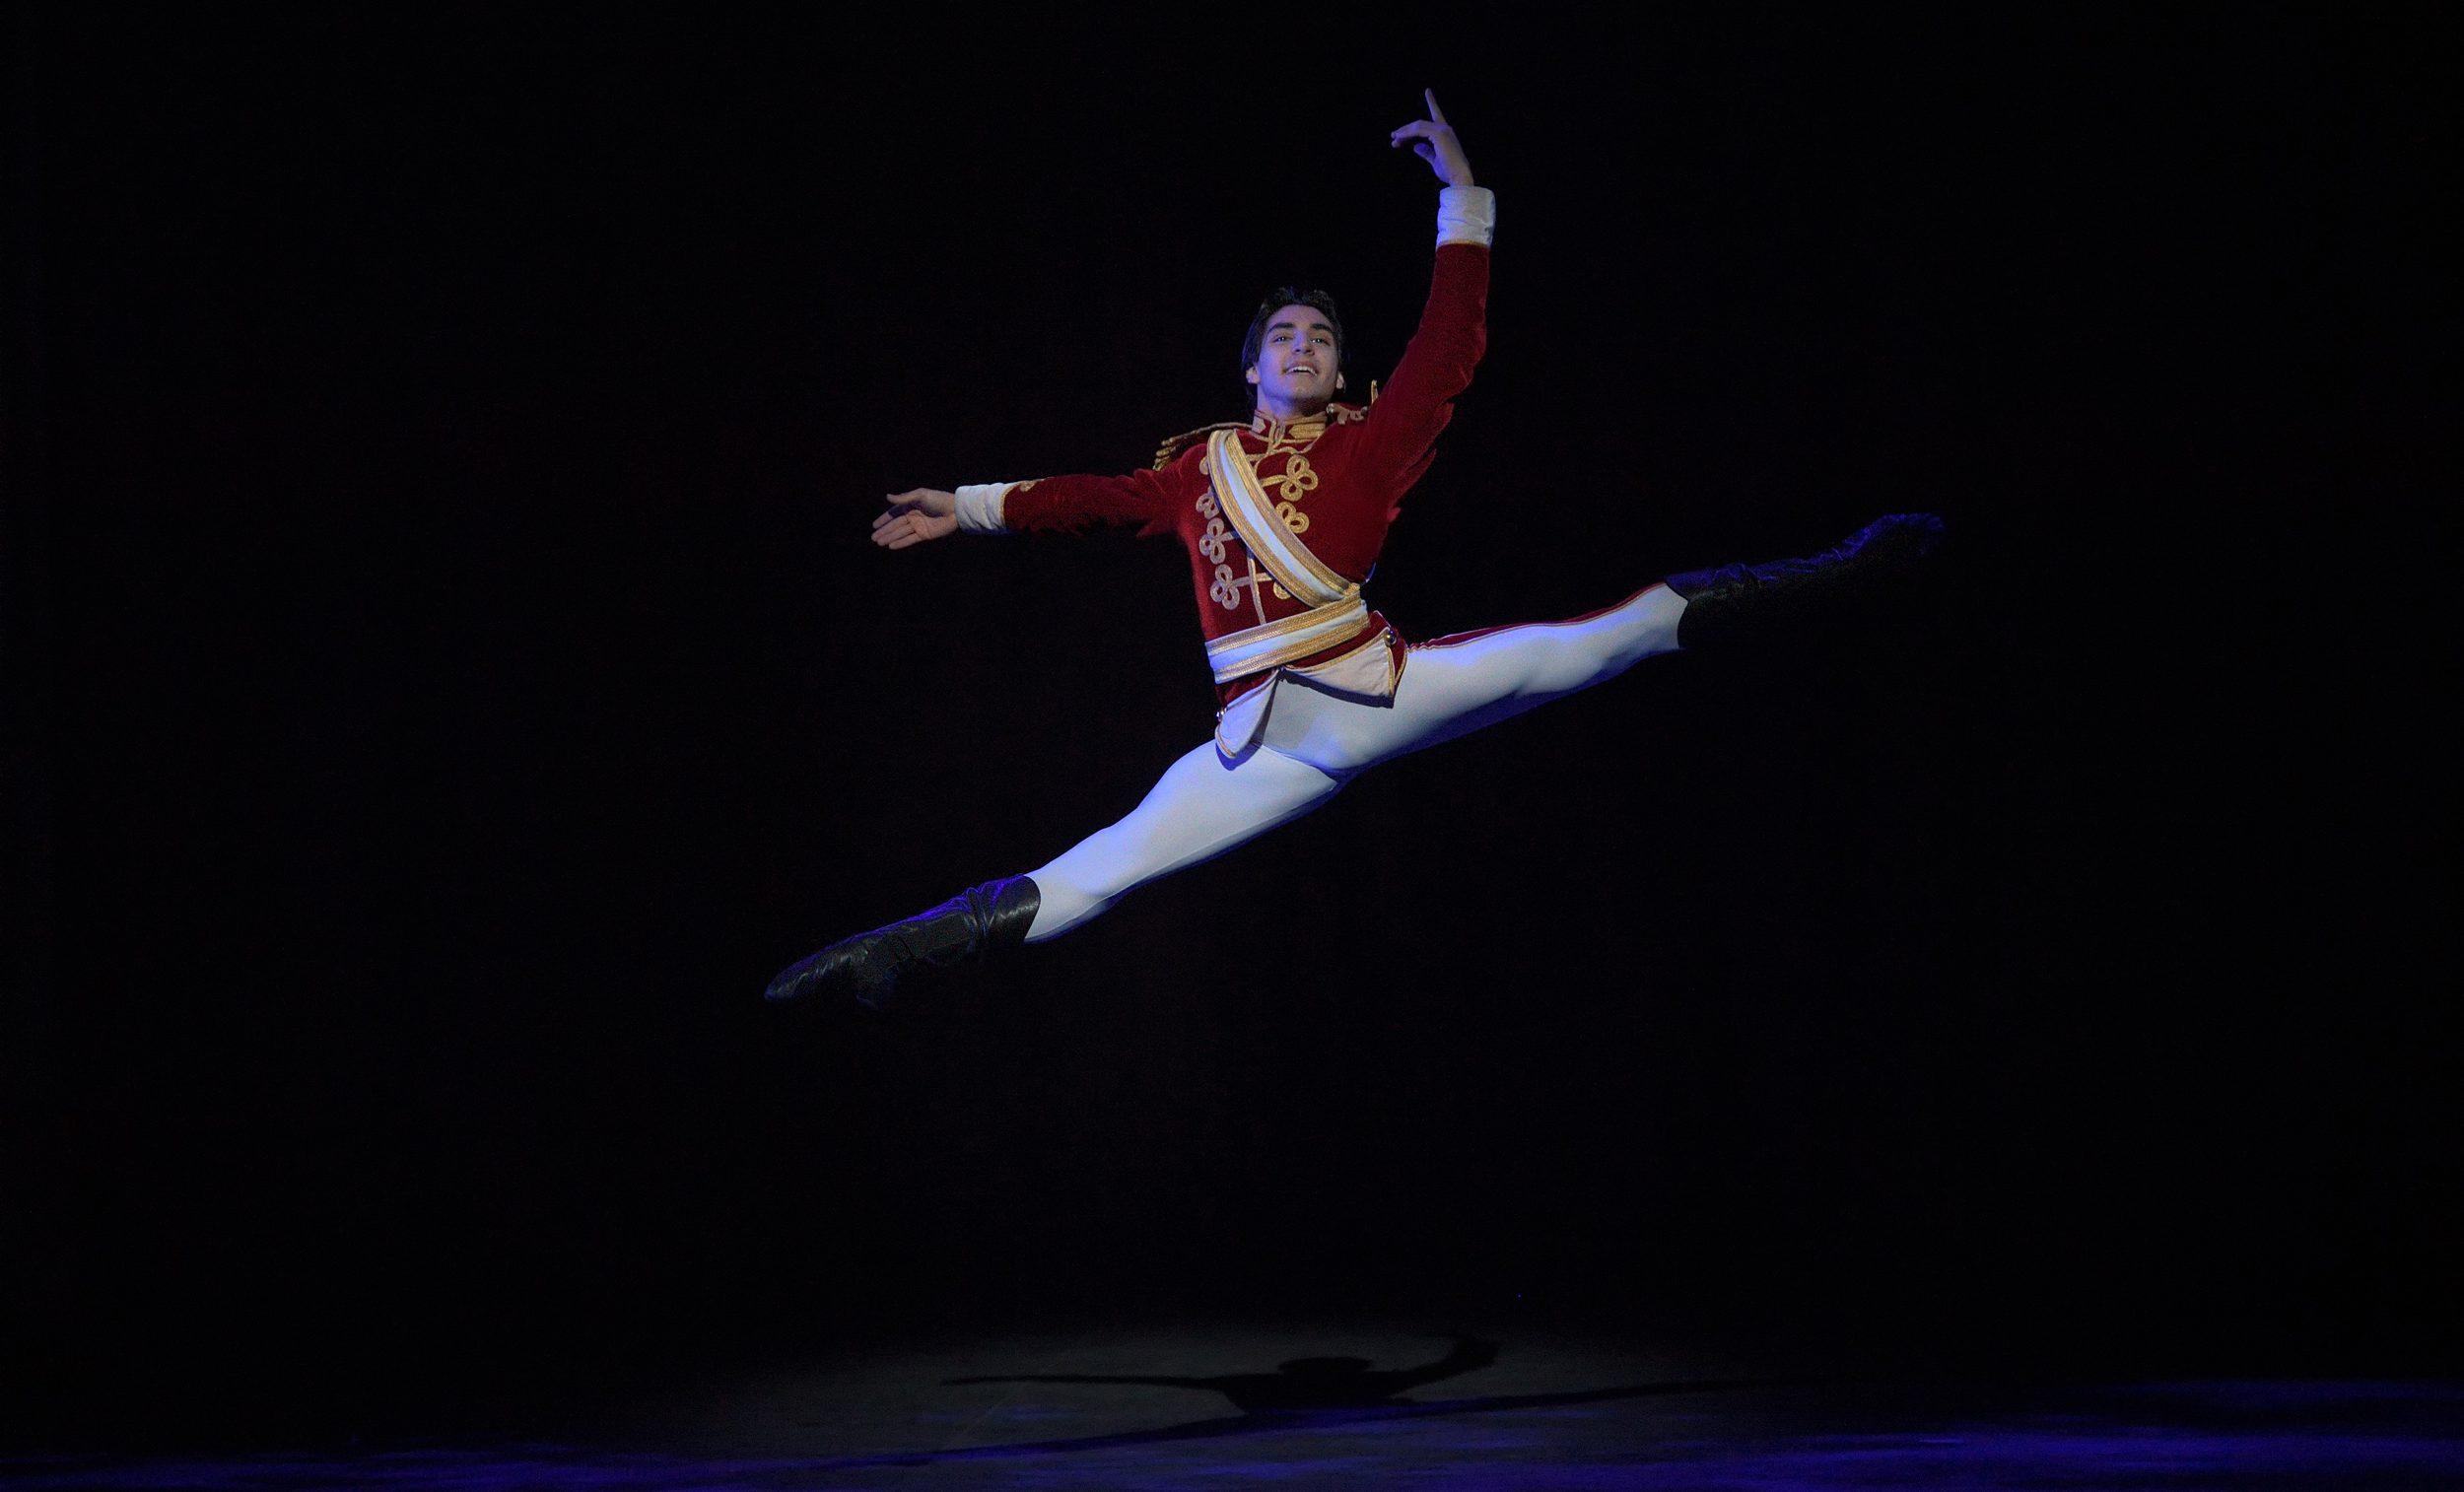 Cesar-Corrales-in-English-National-Ballet's-Nutcracker-(C)-Laurent-Liotardo-2500px-for-web